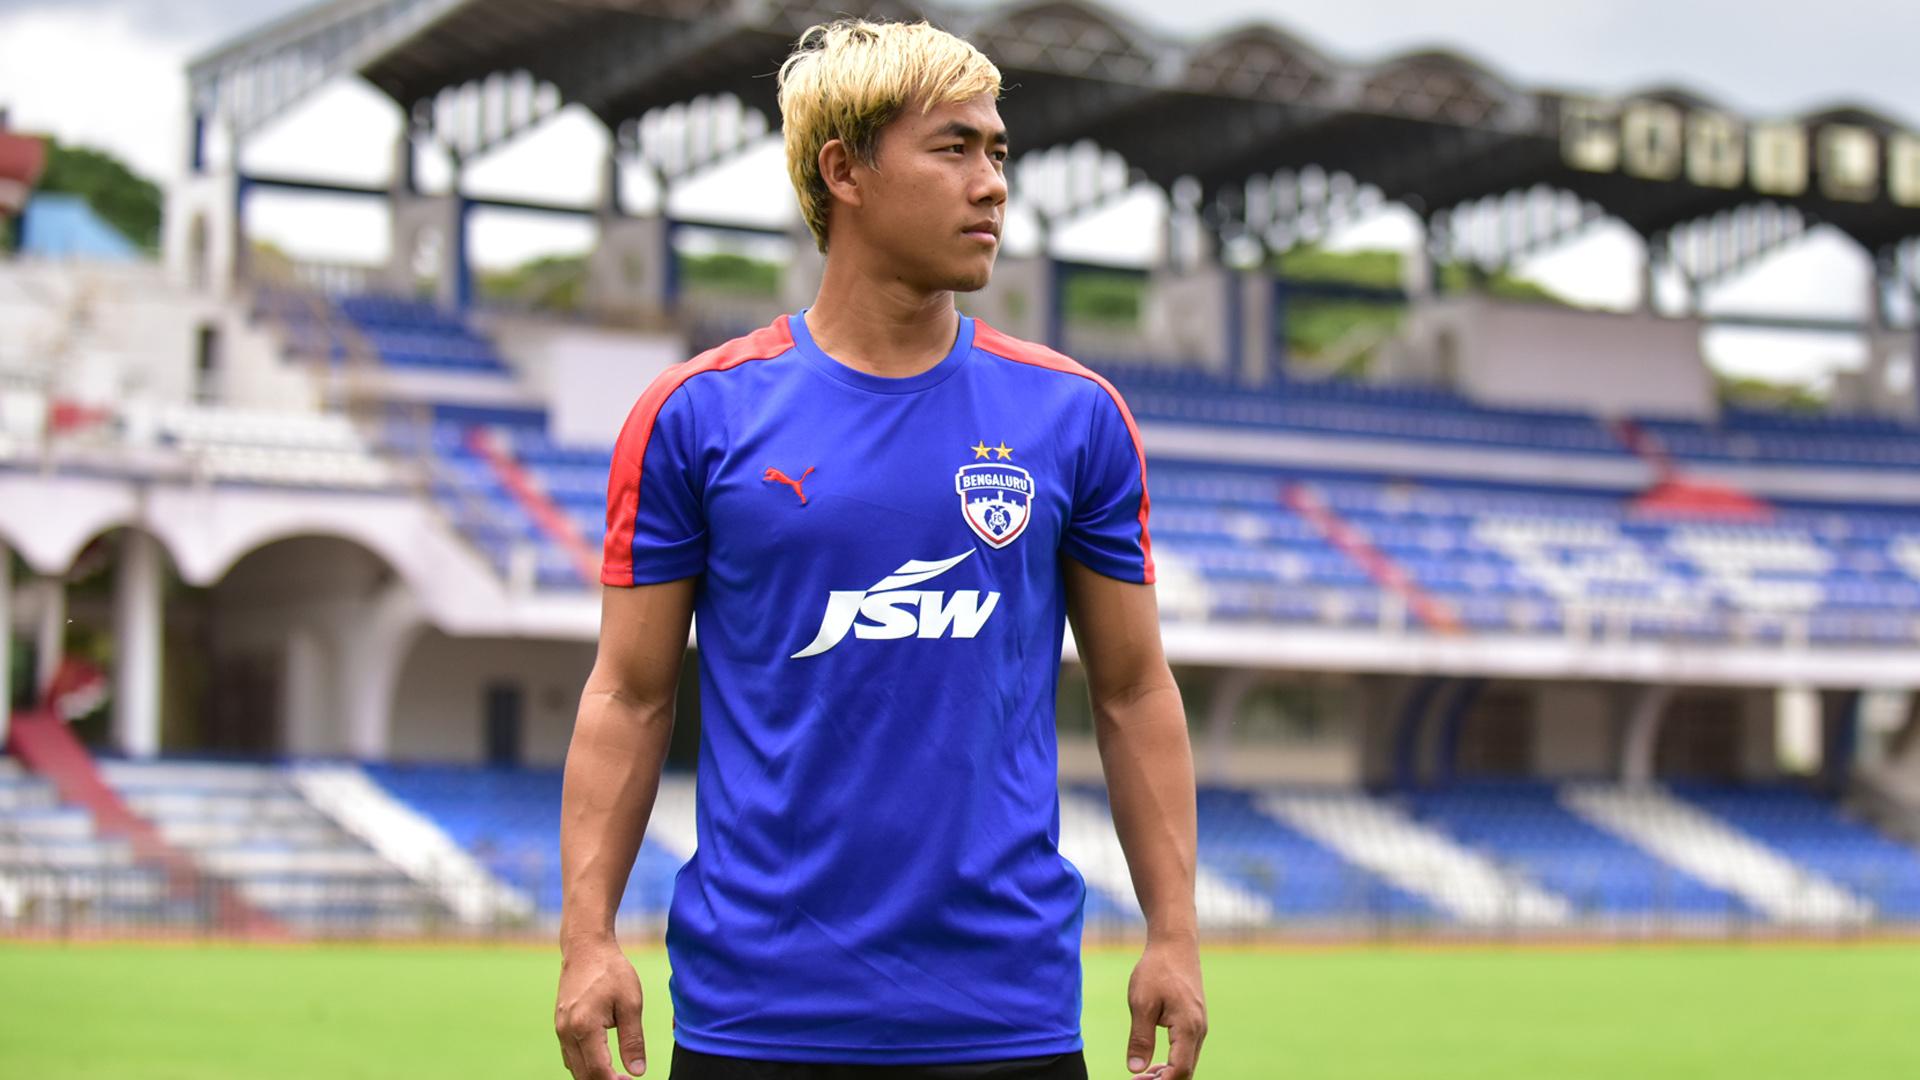 Bidyananda Singh Bengaluru FC training session